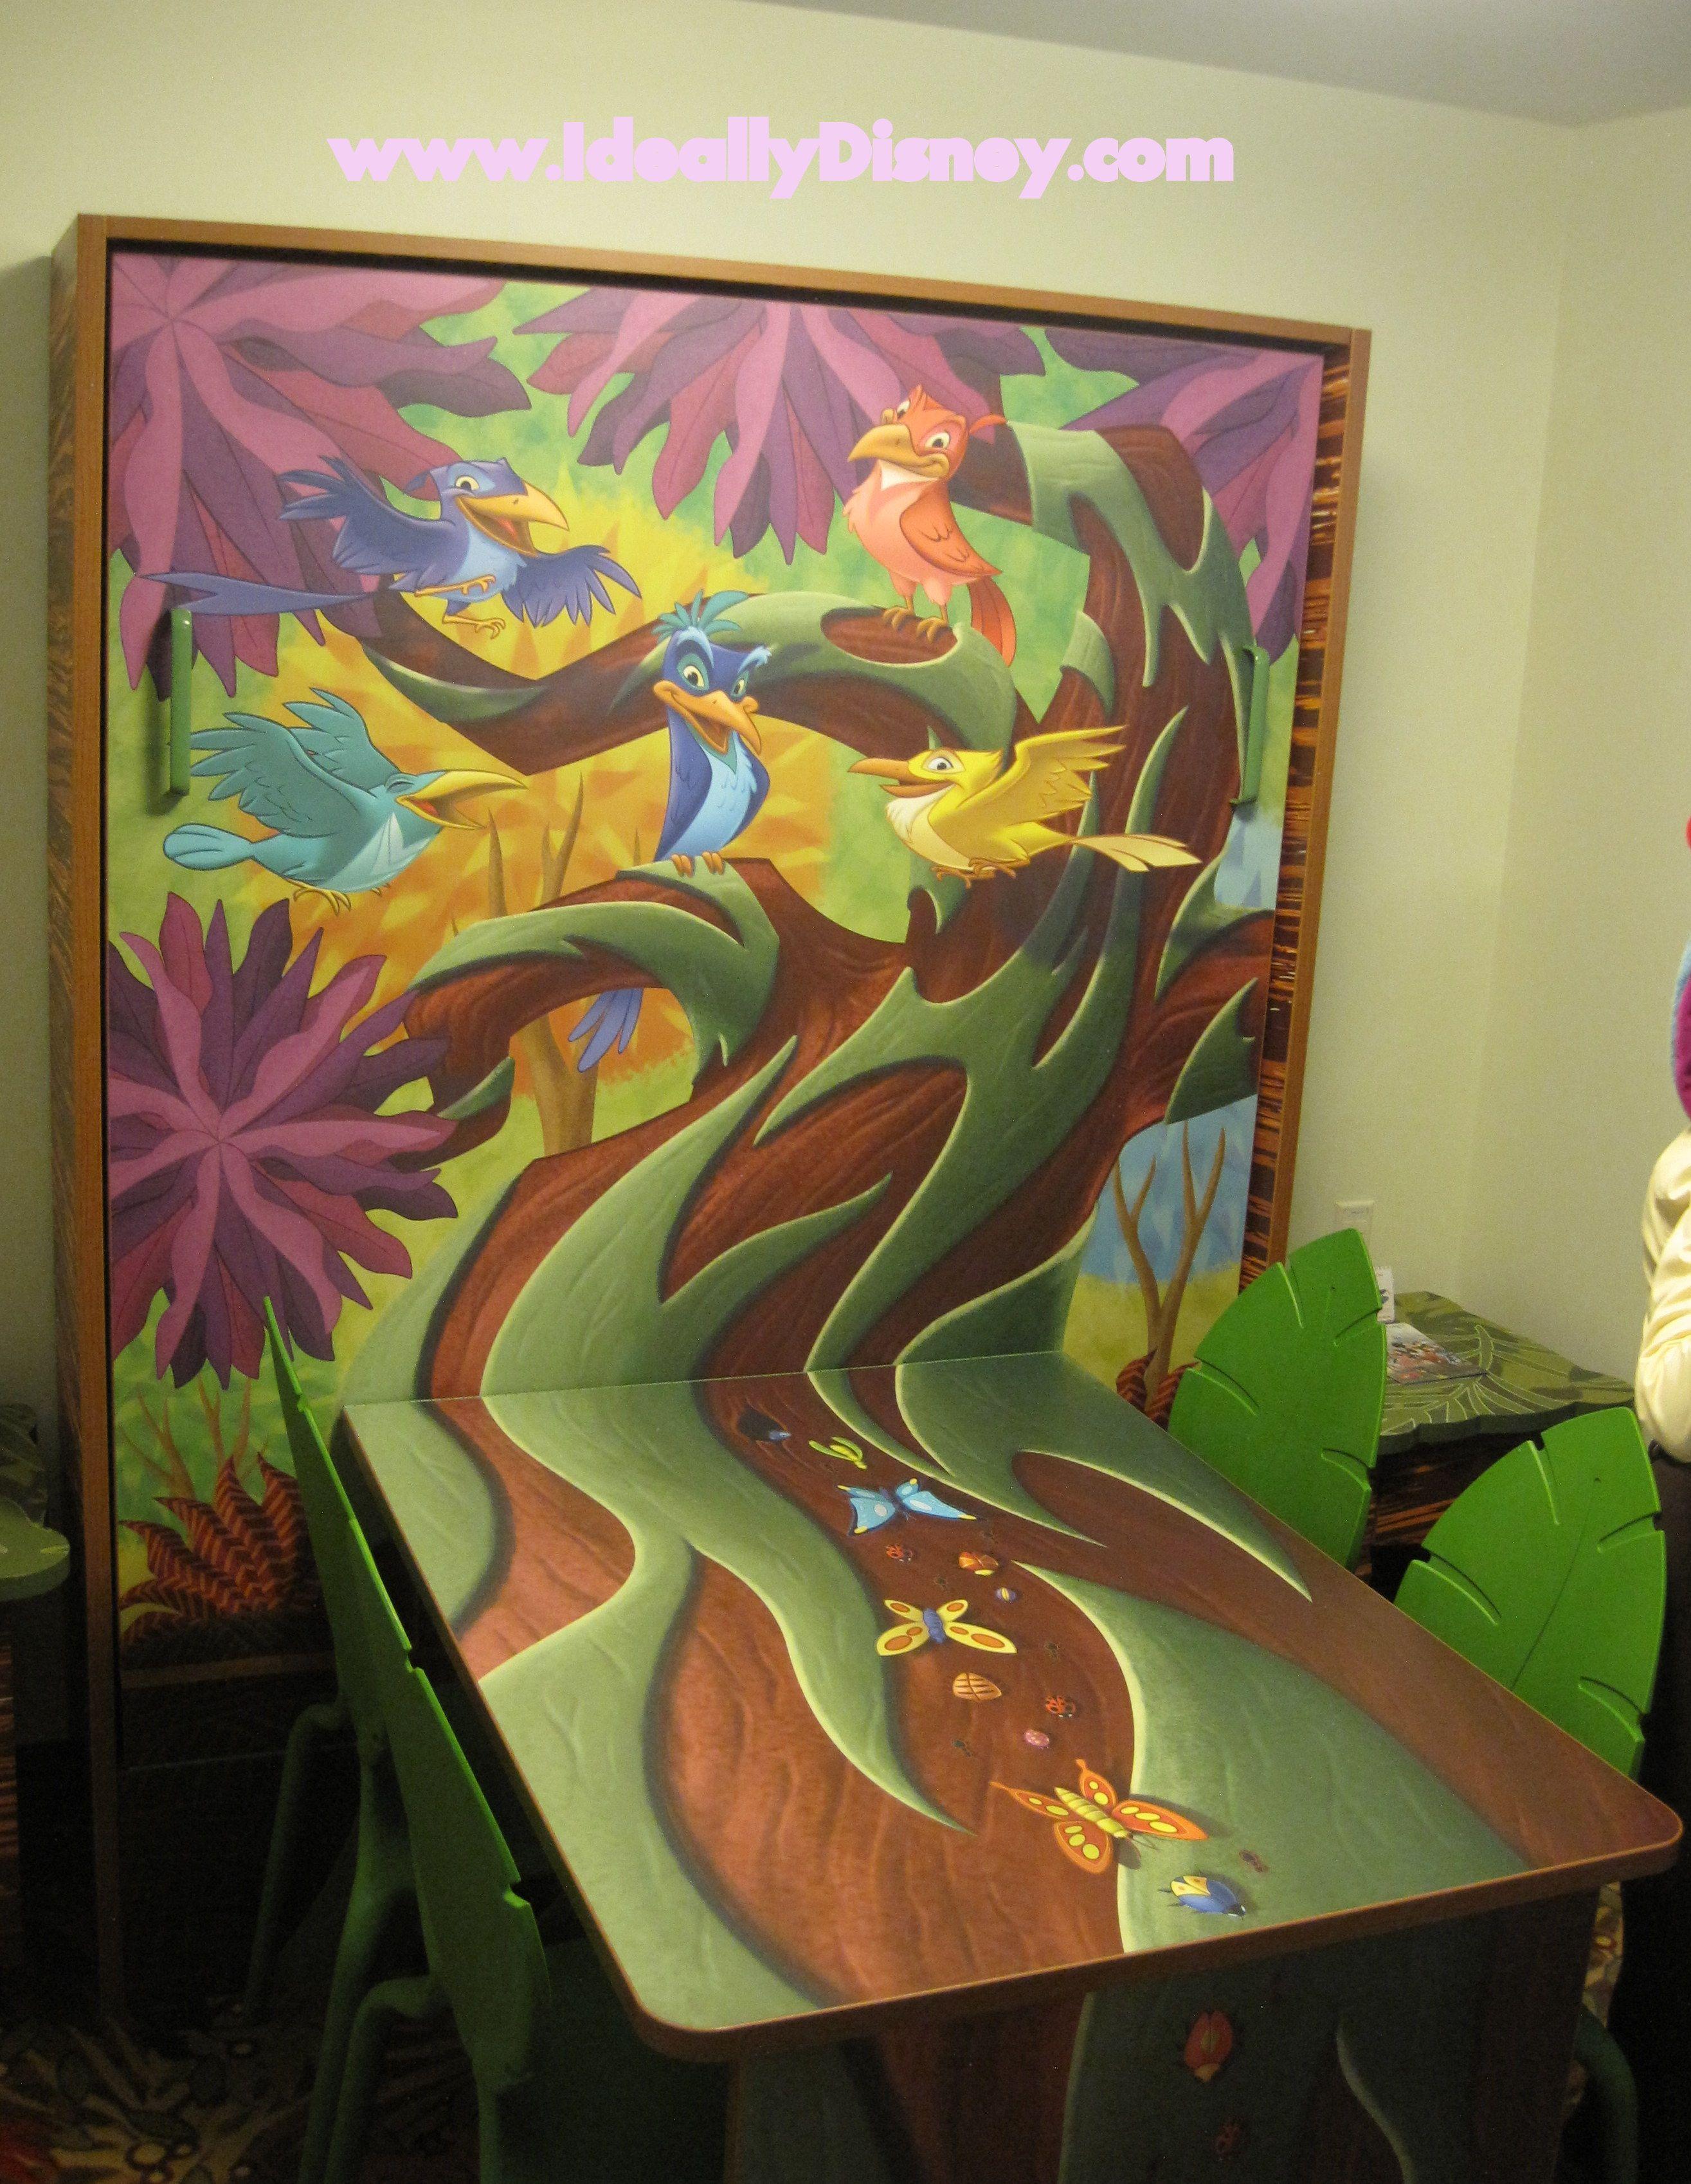 Disneys art of animation lion king family suite disney